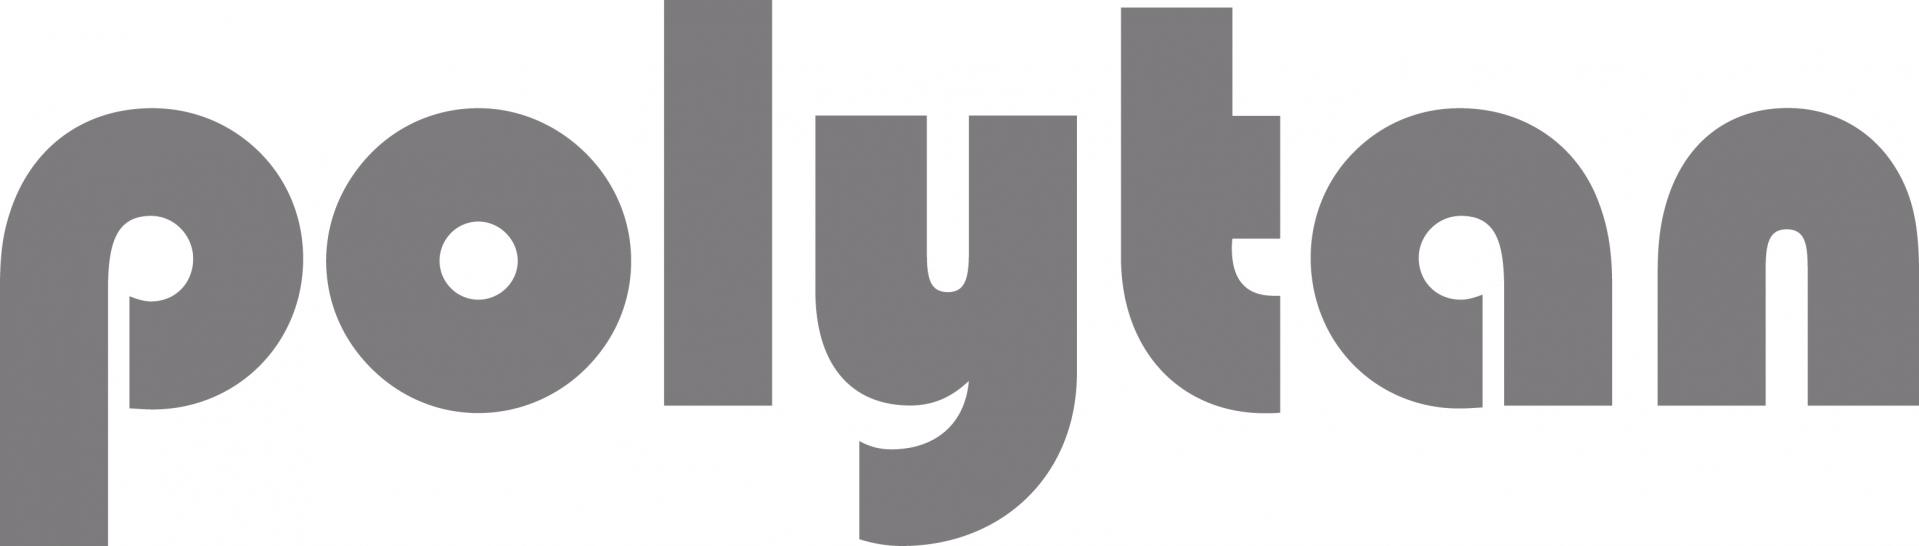 Logo polytan 2013 4c